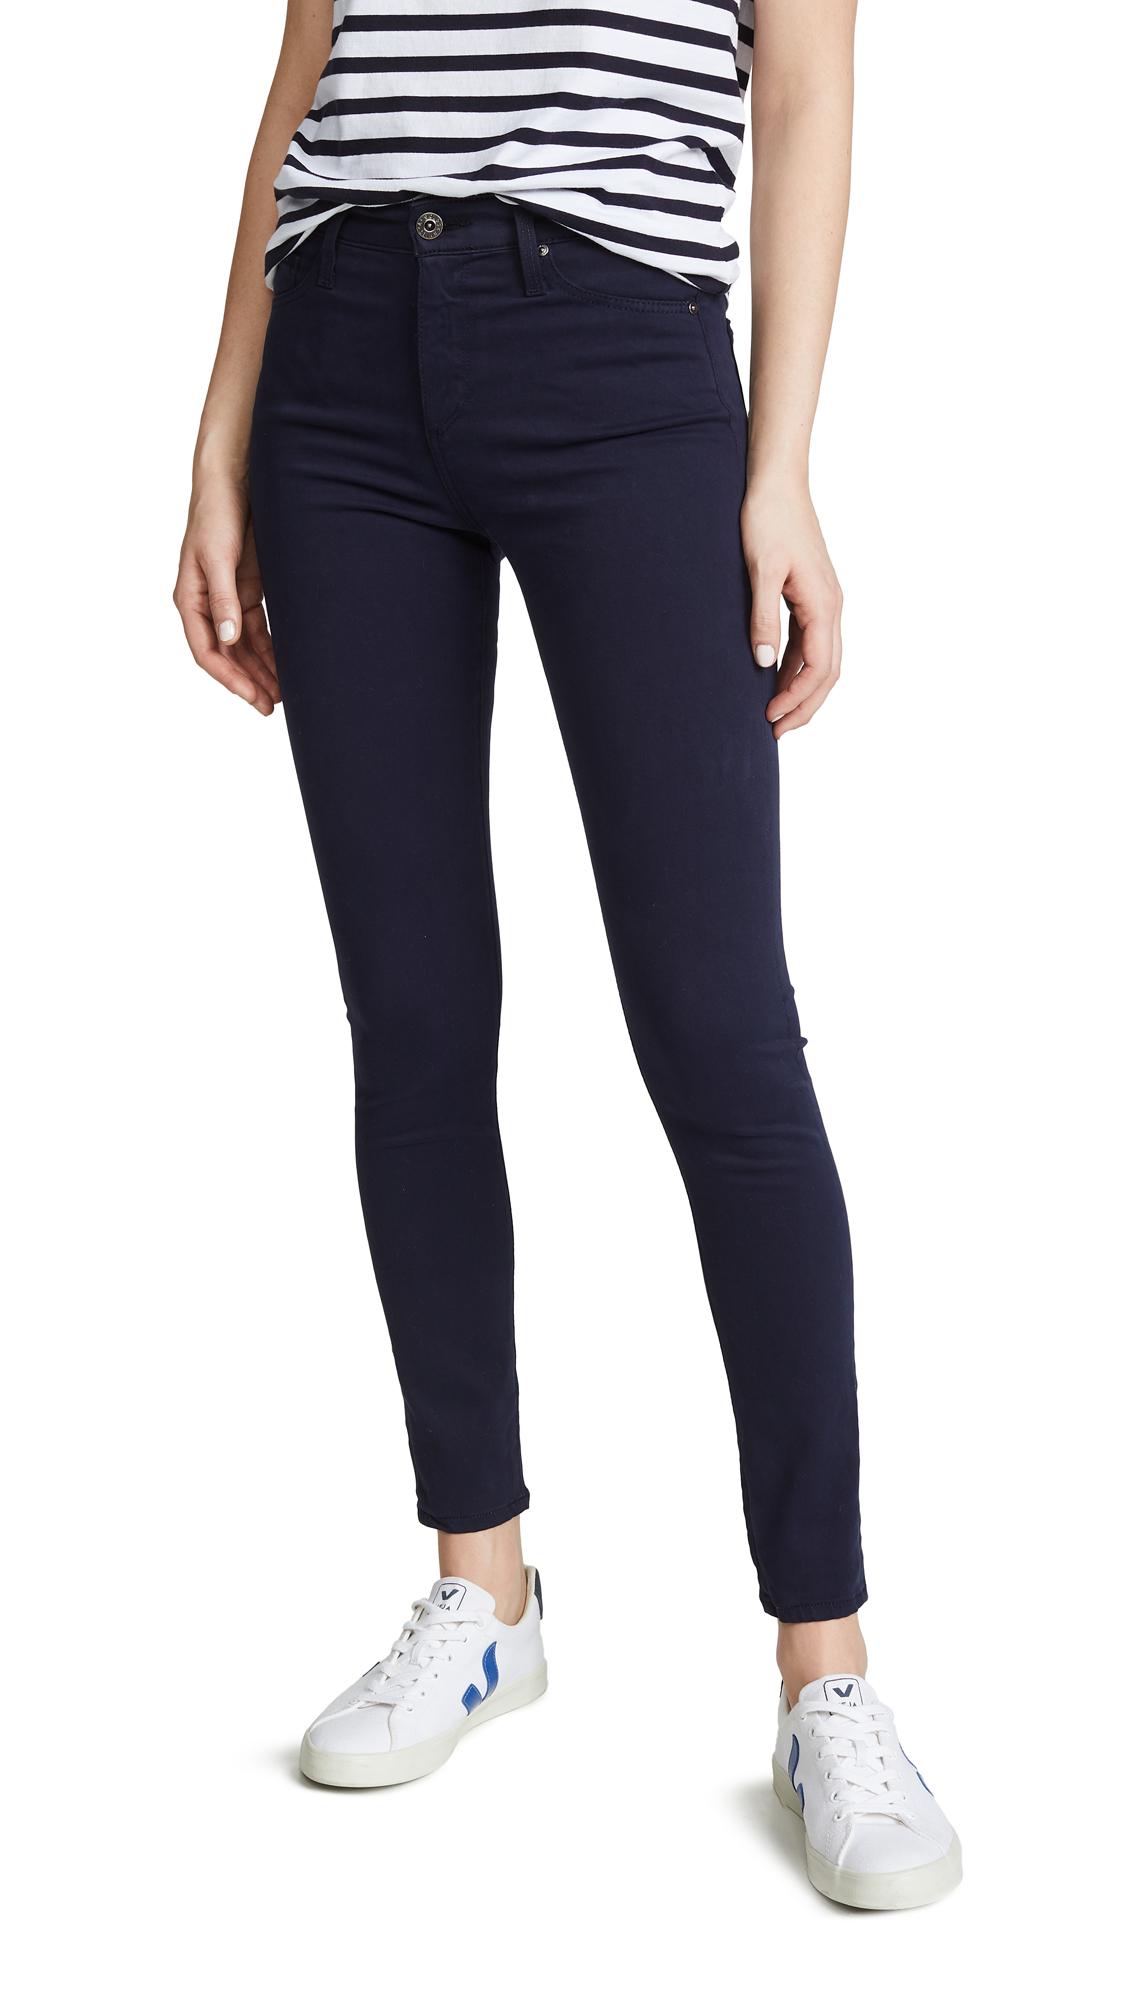 AG The Farrah Skinny Ankle Jeans - Indigo Ink